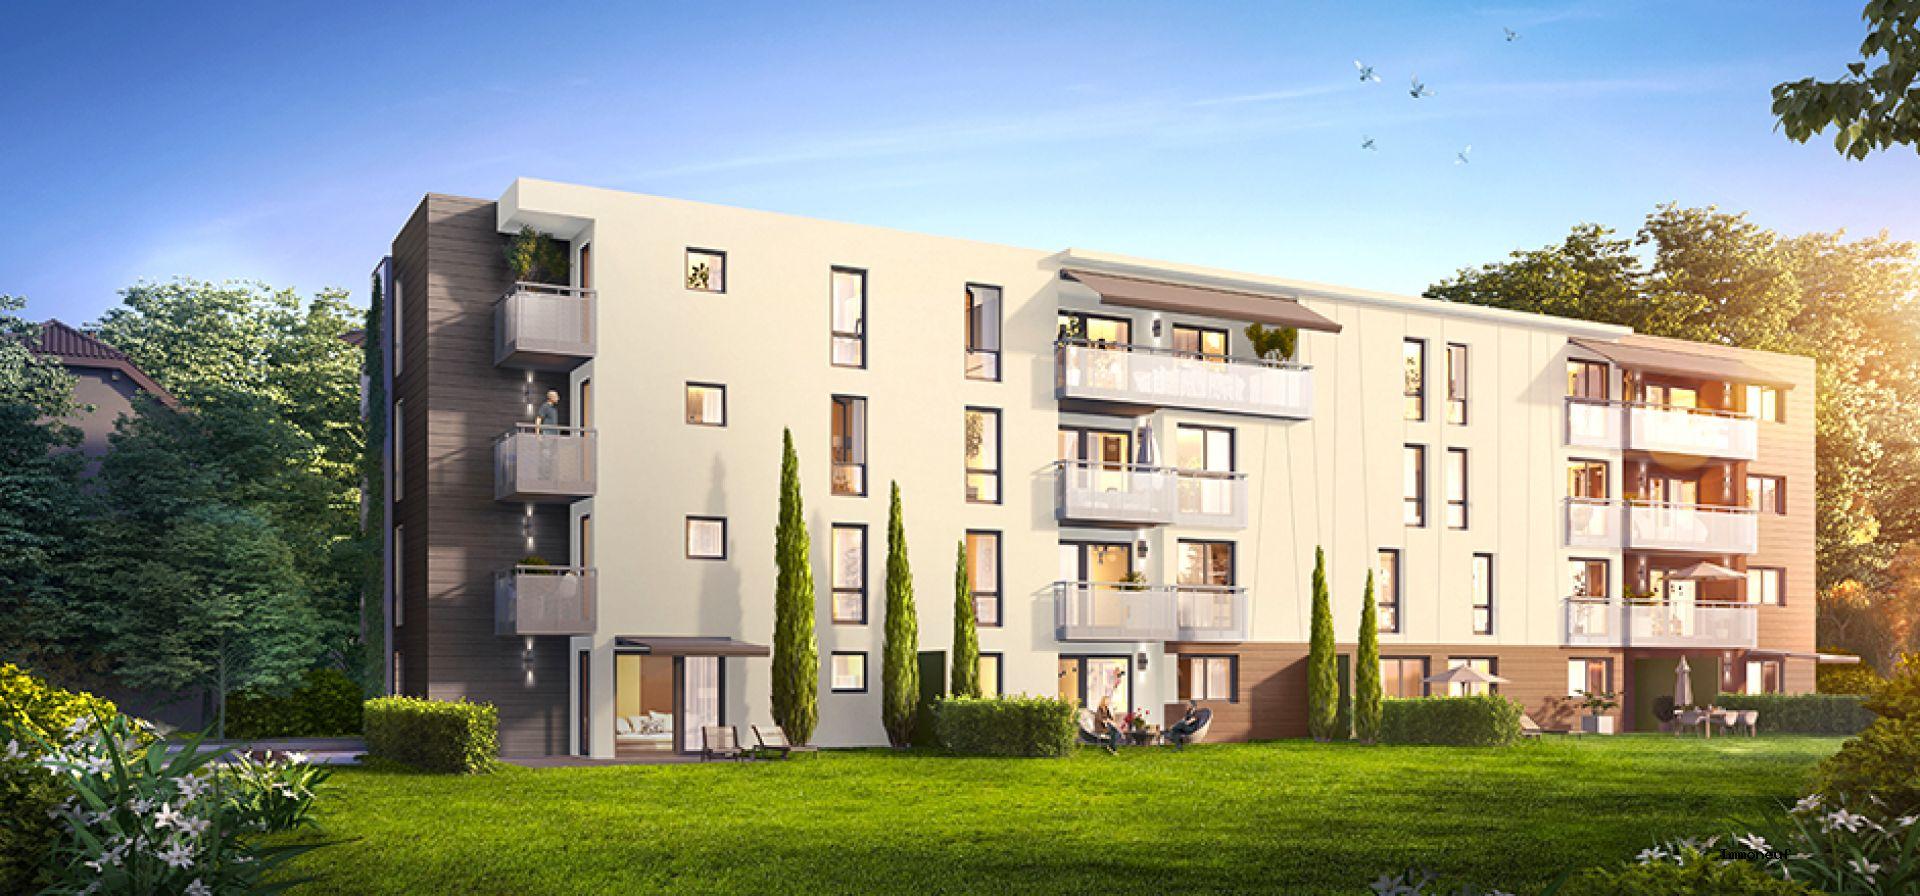 Annonce vente appartement annemasse 74100 62 m 274 for Annonce vente appartement